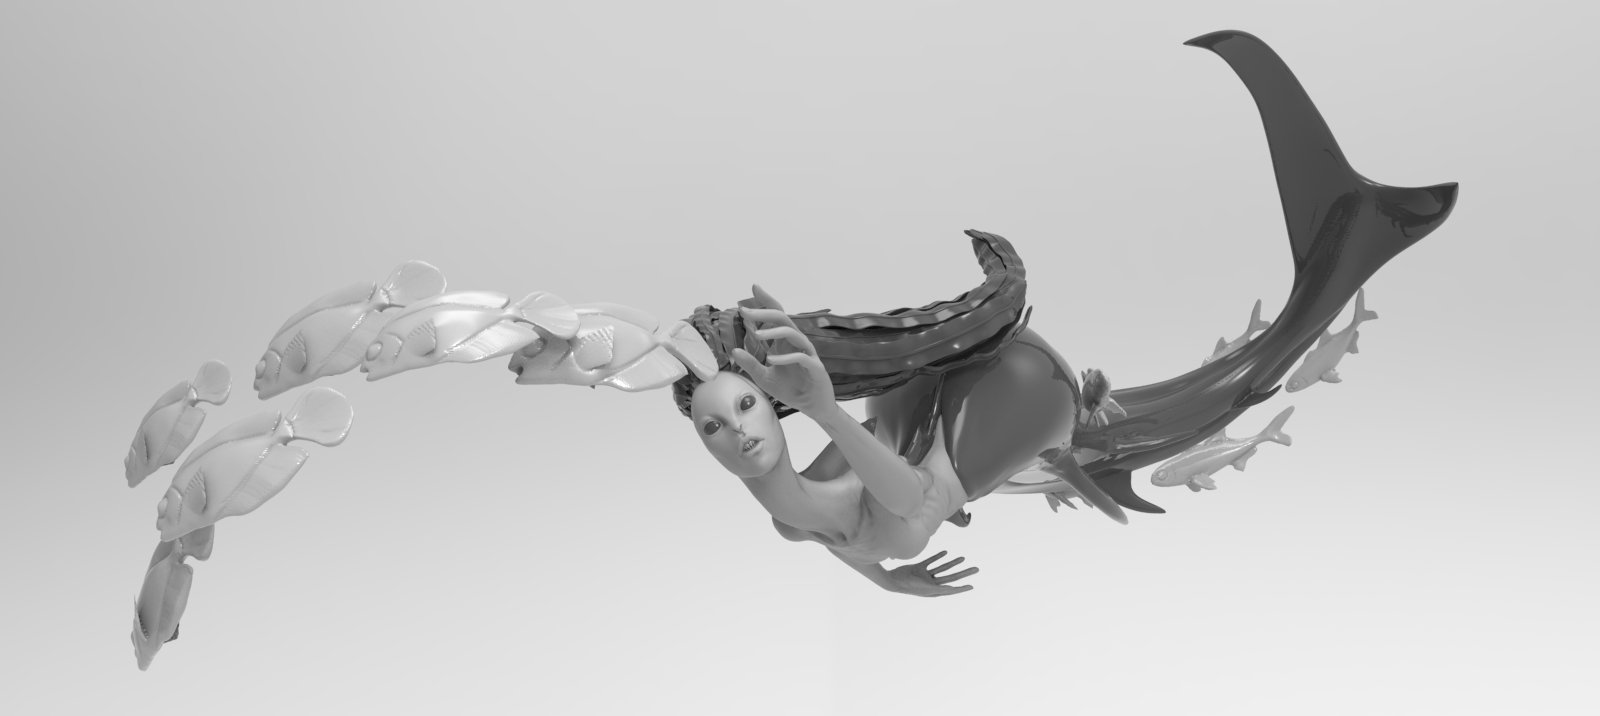 Test Mermaid Render, before I reworked her hair for 3d print